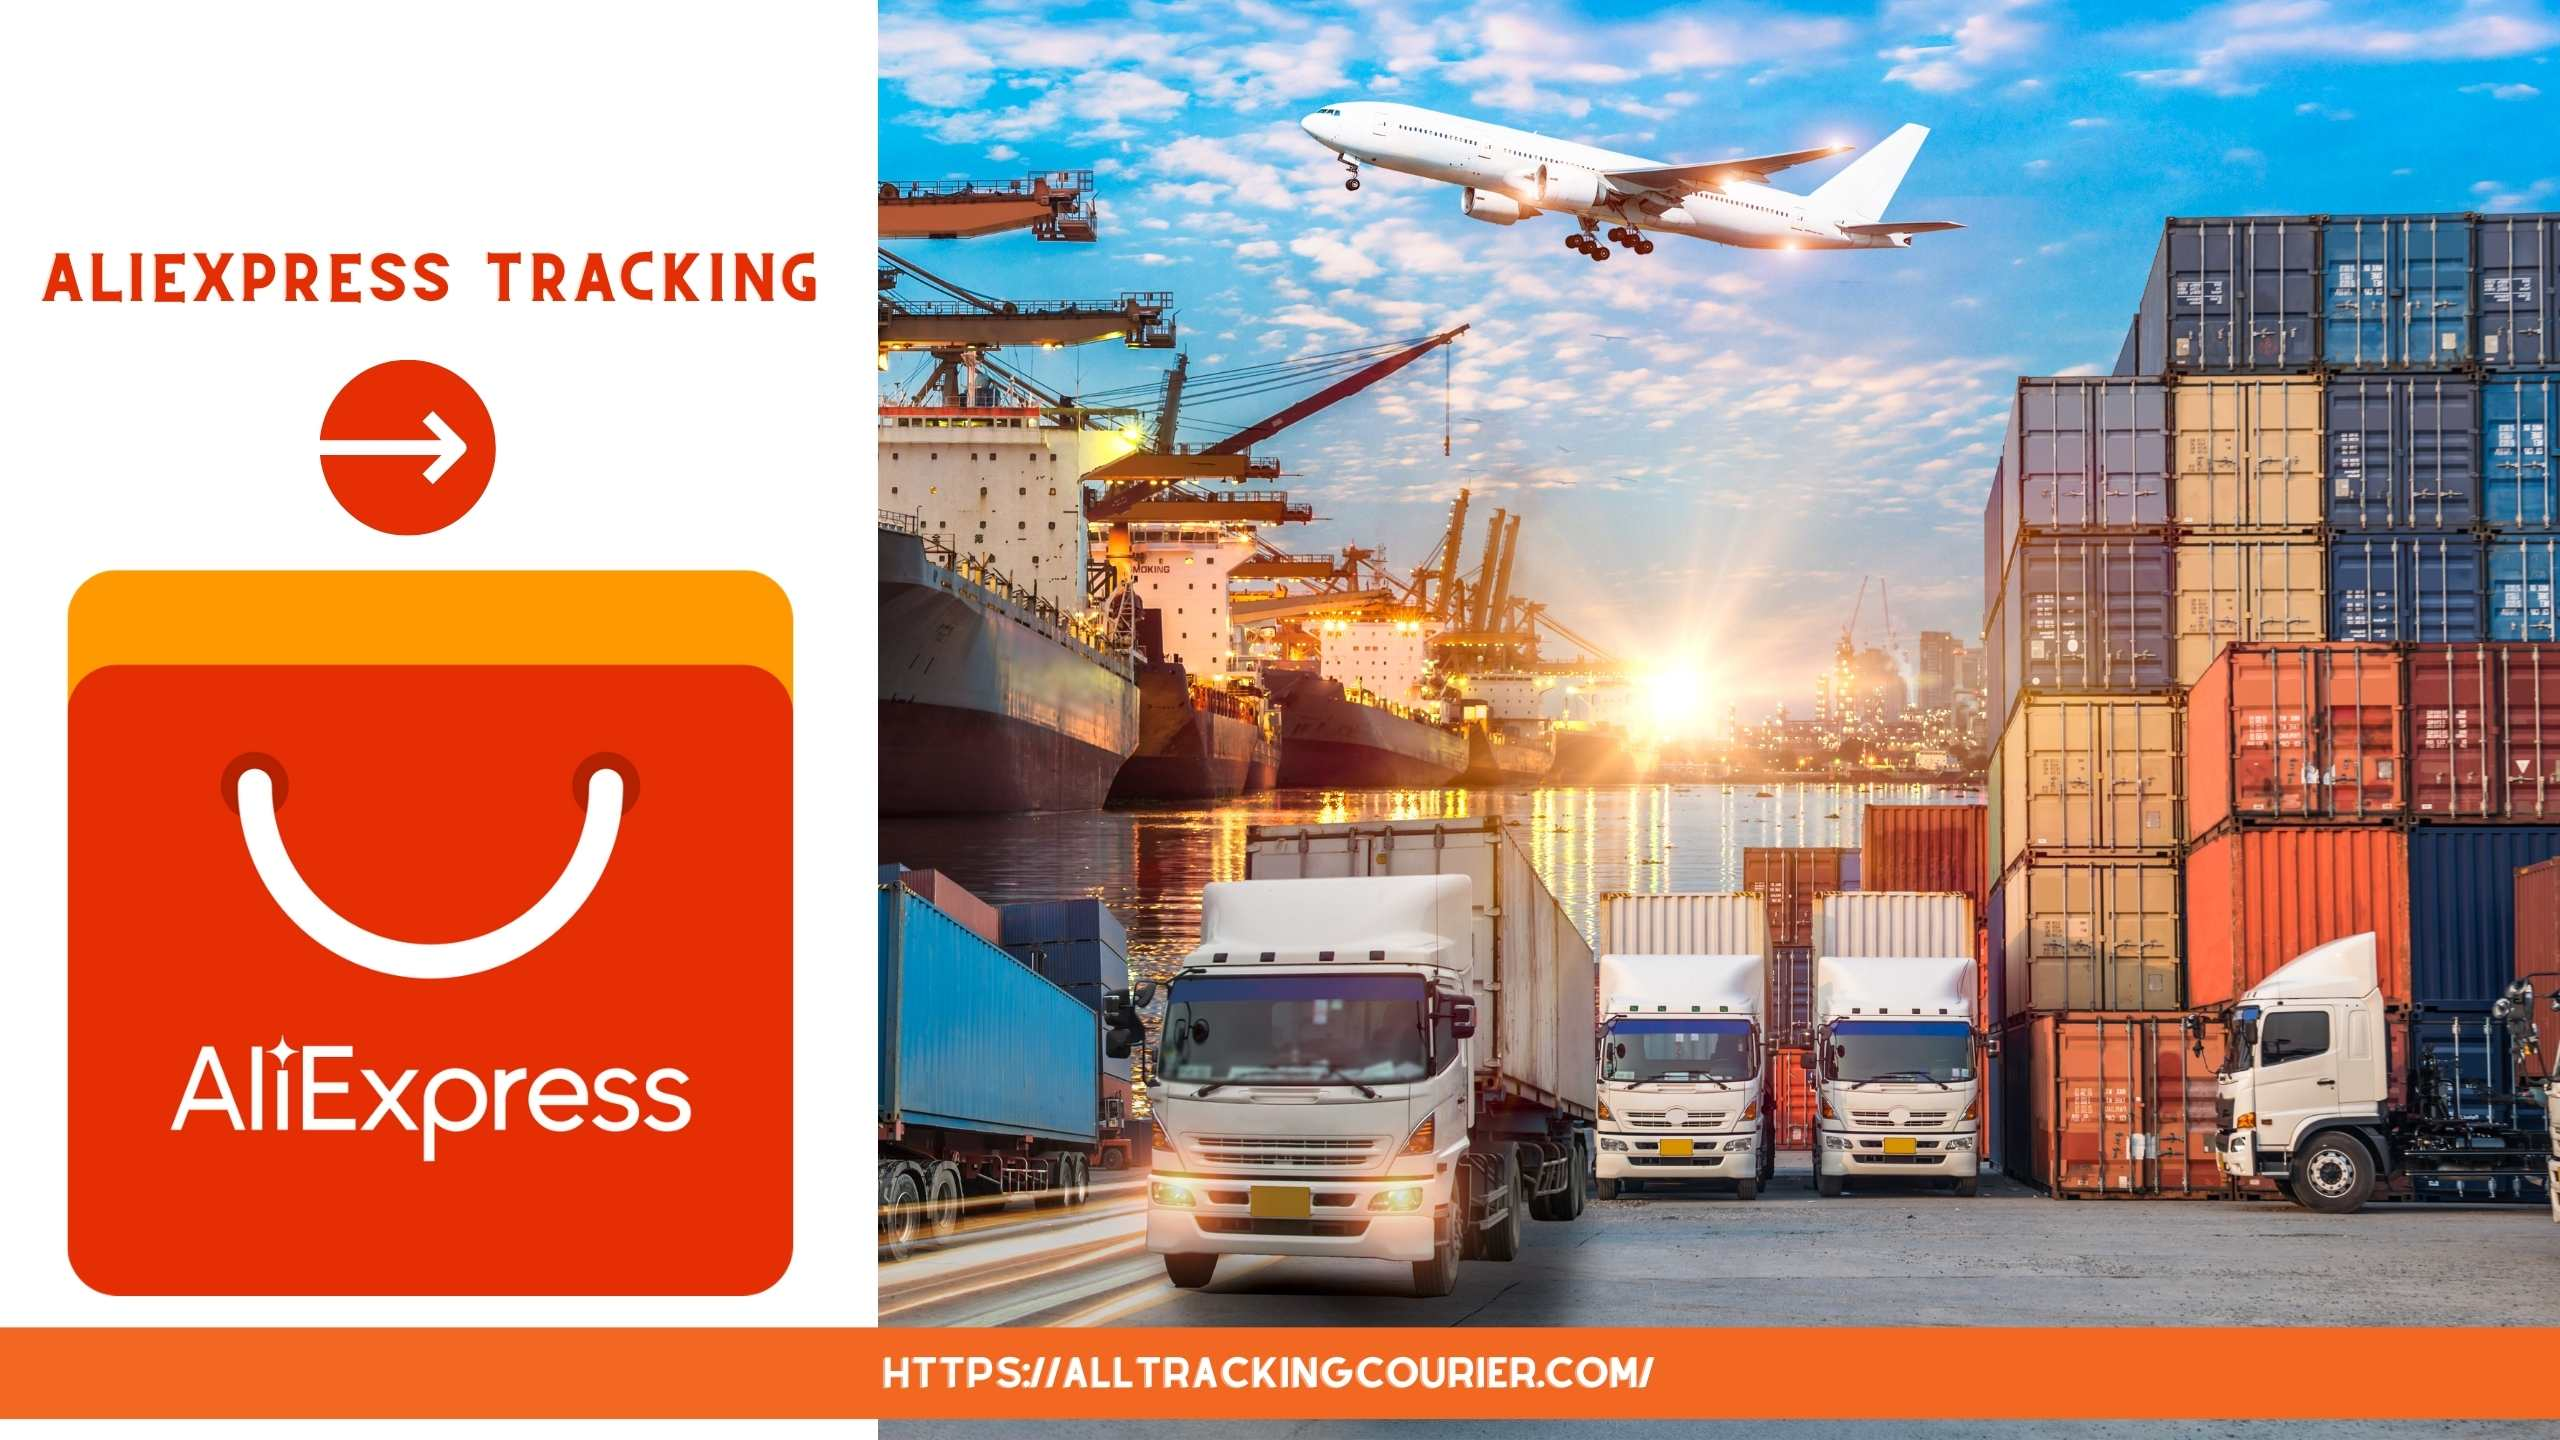 Aliexpress Tracking